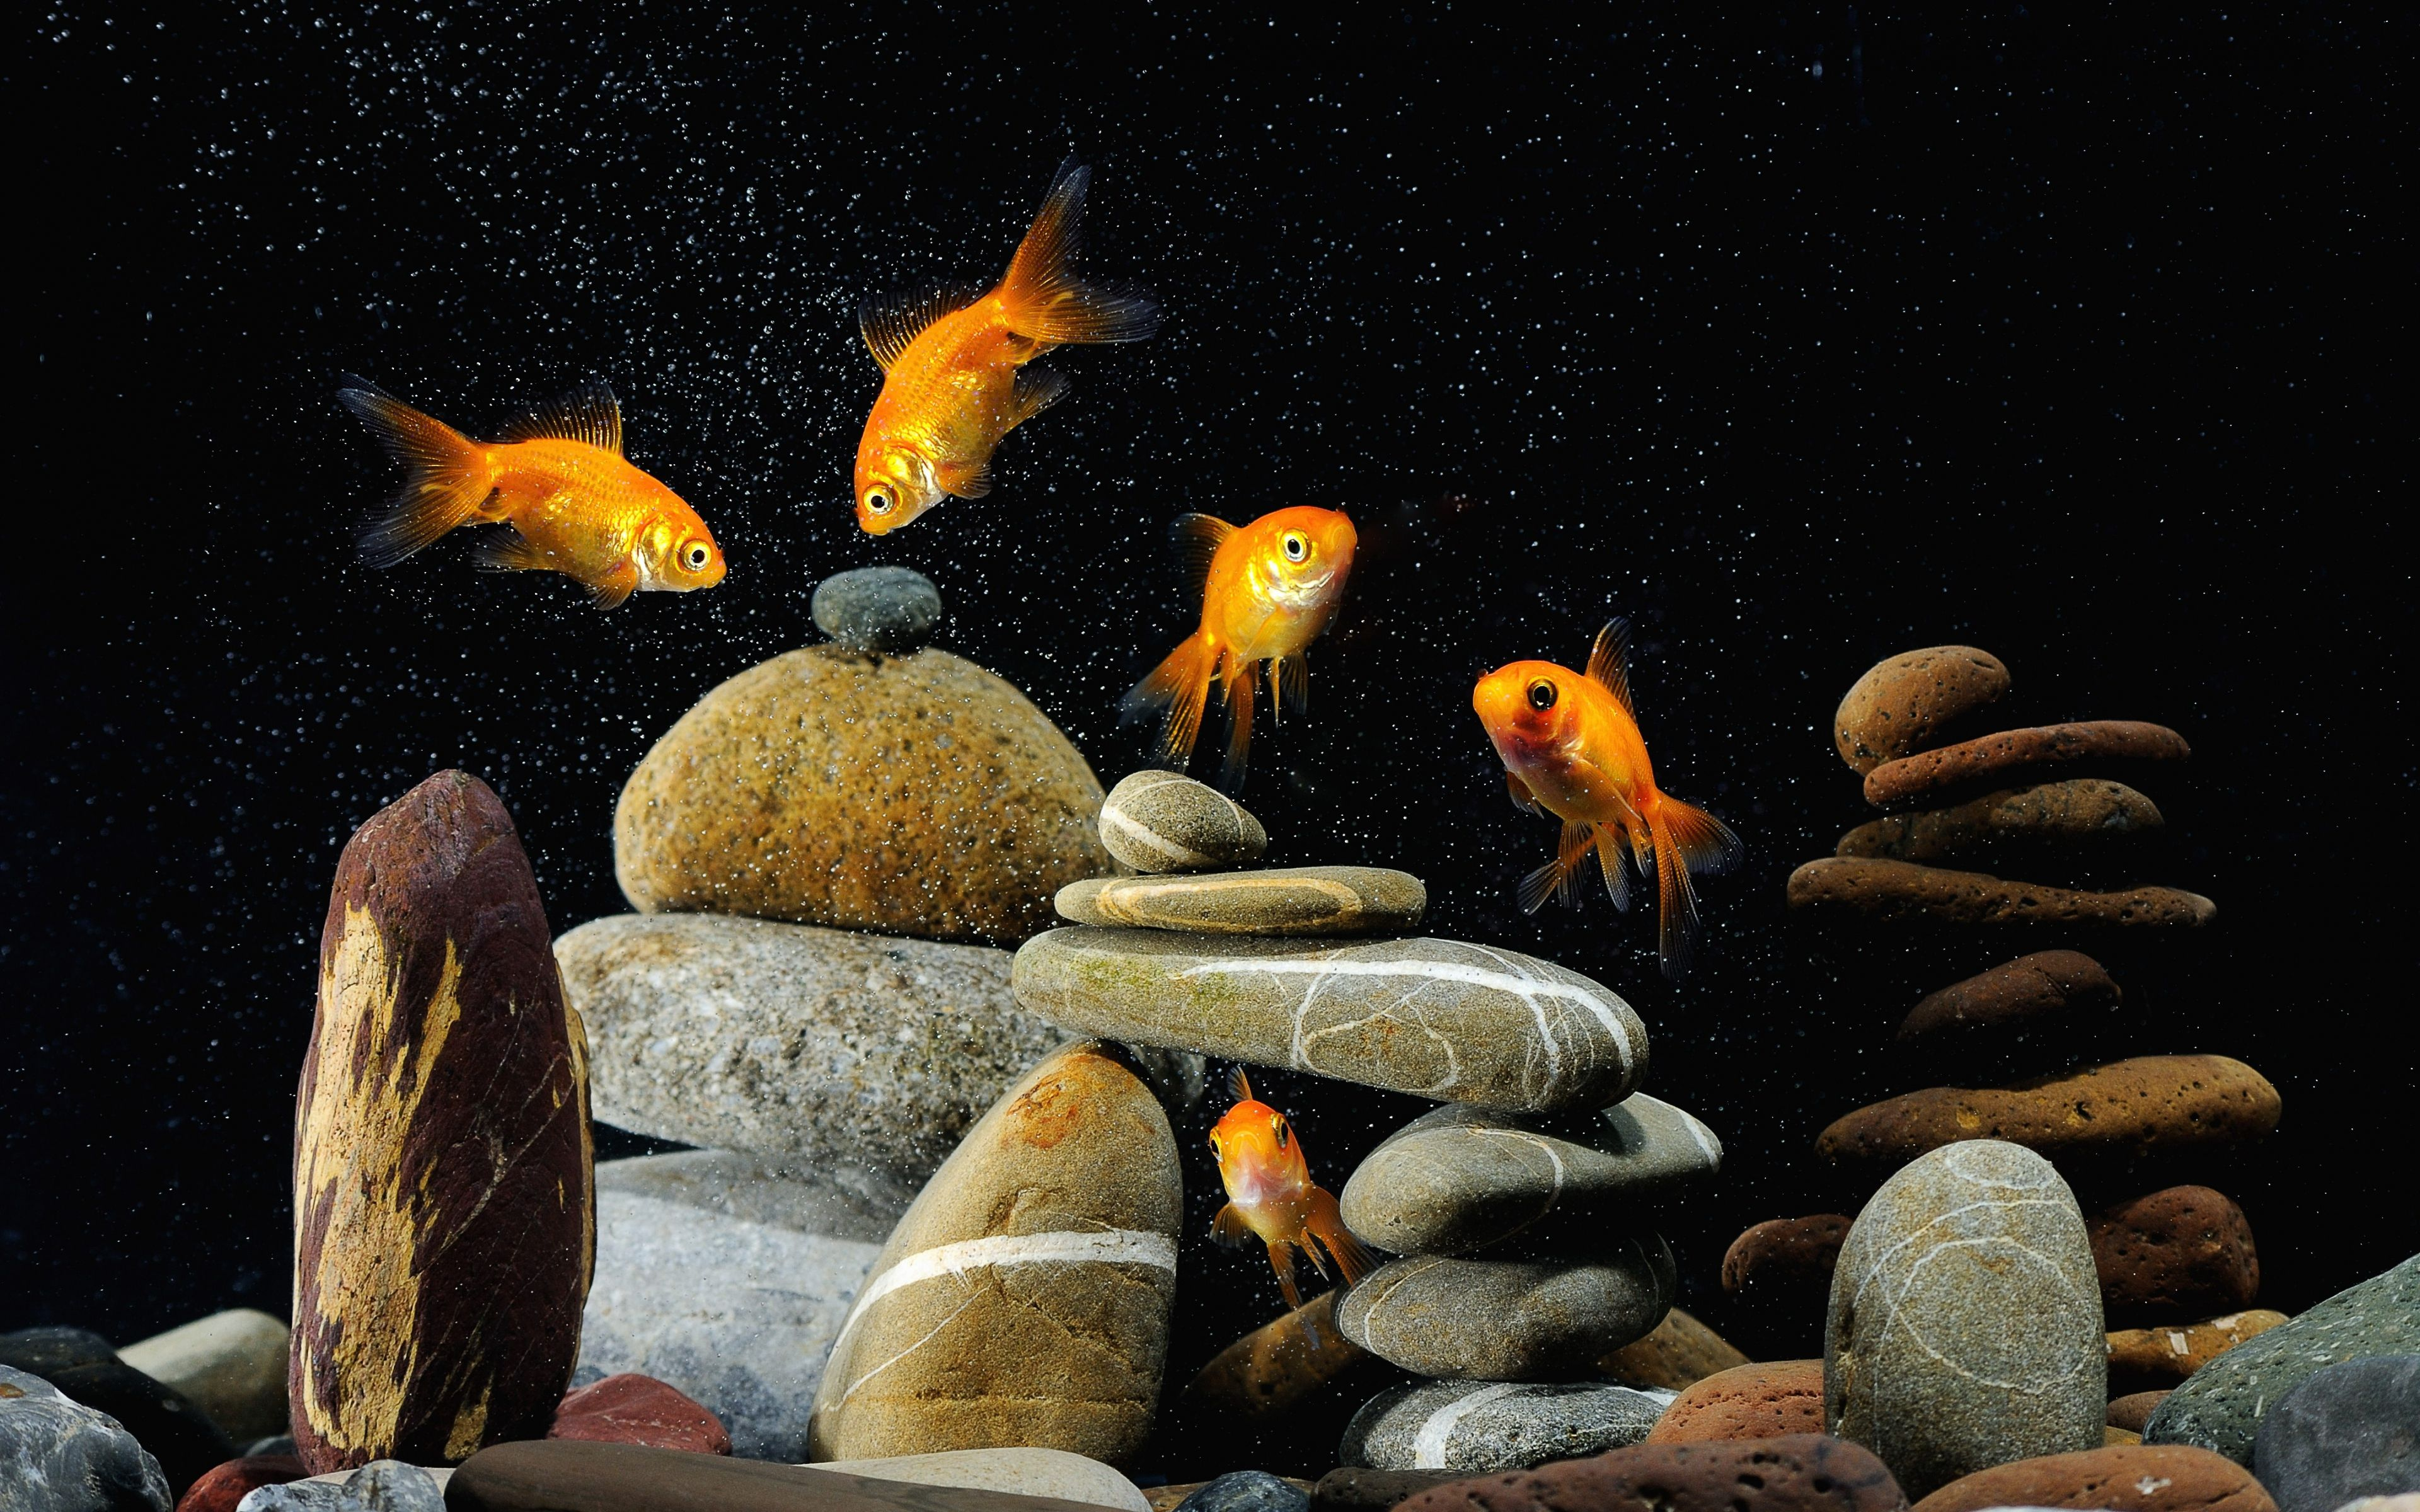 Download Free Aquarium Wallpapers Aquarium Wallpaper For Desktop 3840x2400 Wallpaper Teahub Io